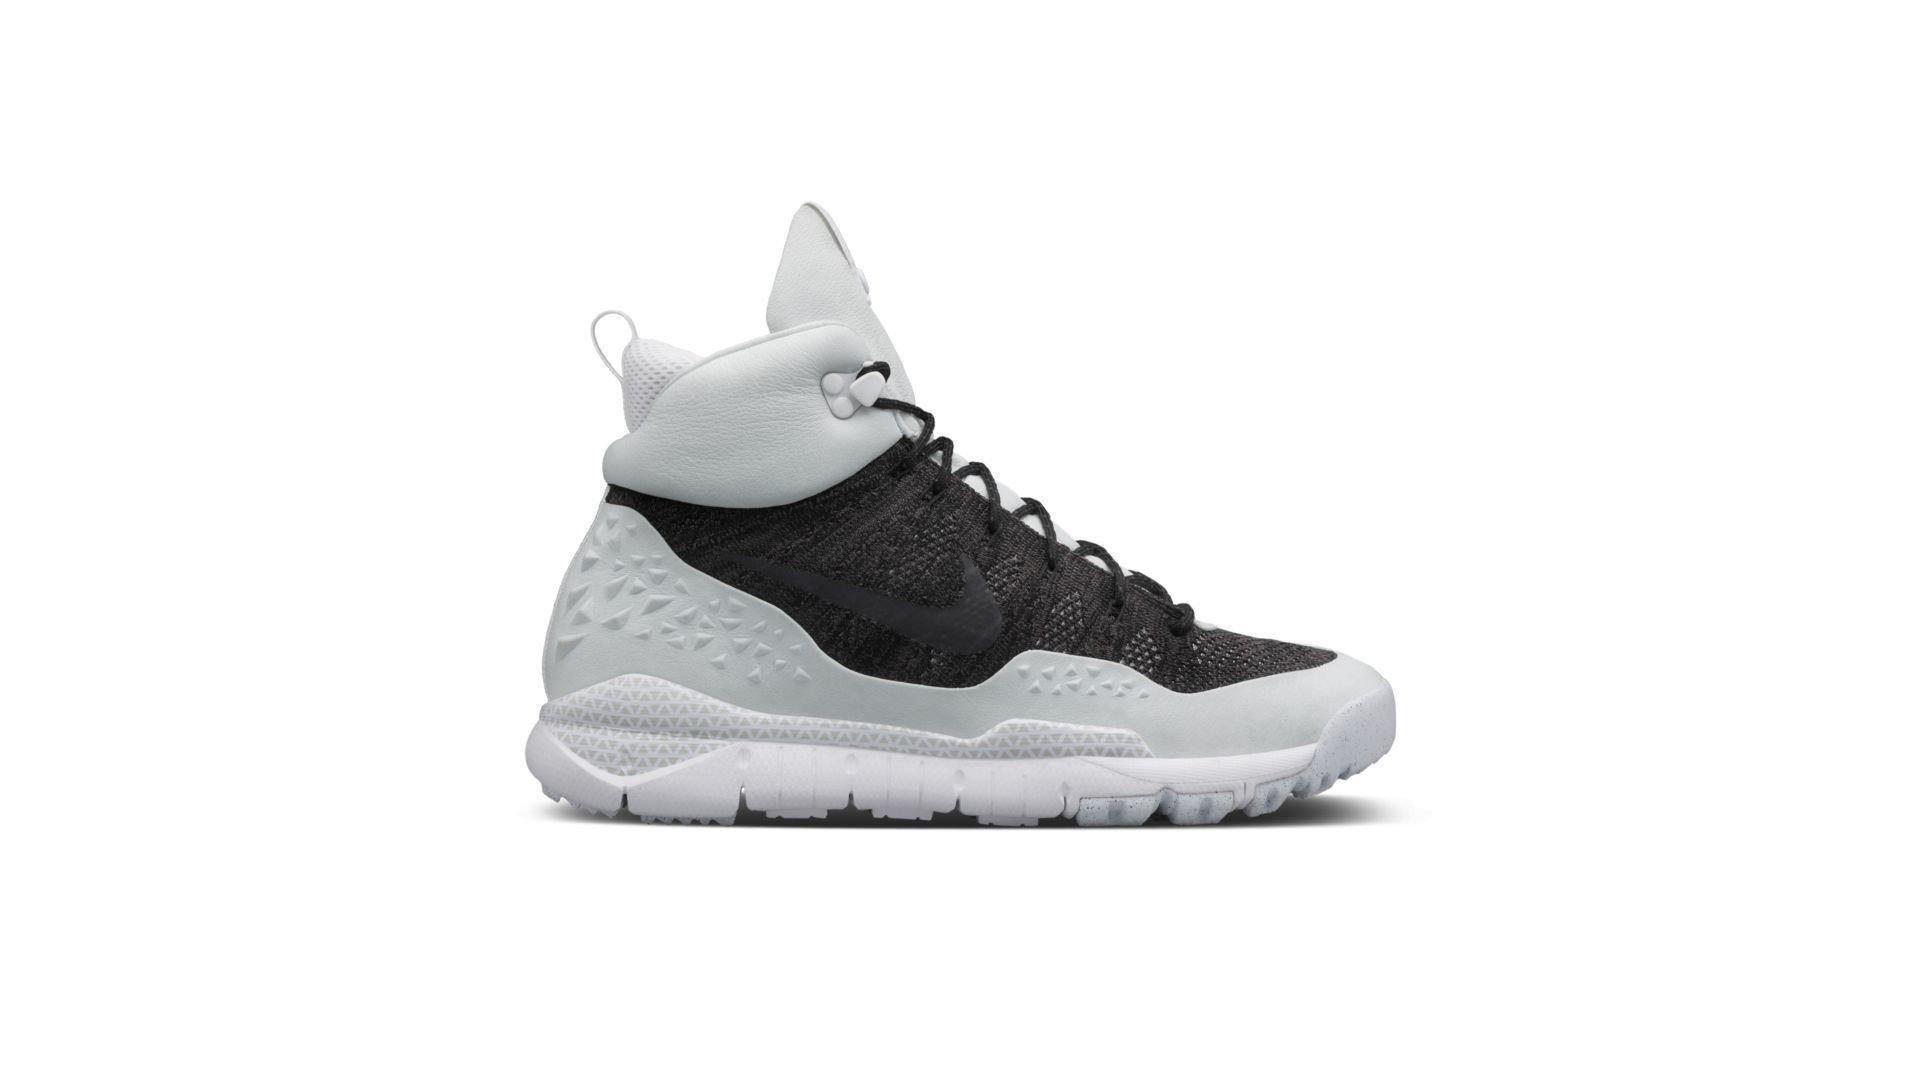 Nike Lupinek Flyknit Black White (826077-002)